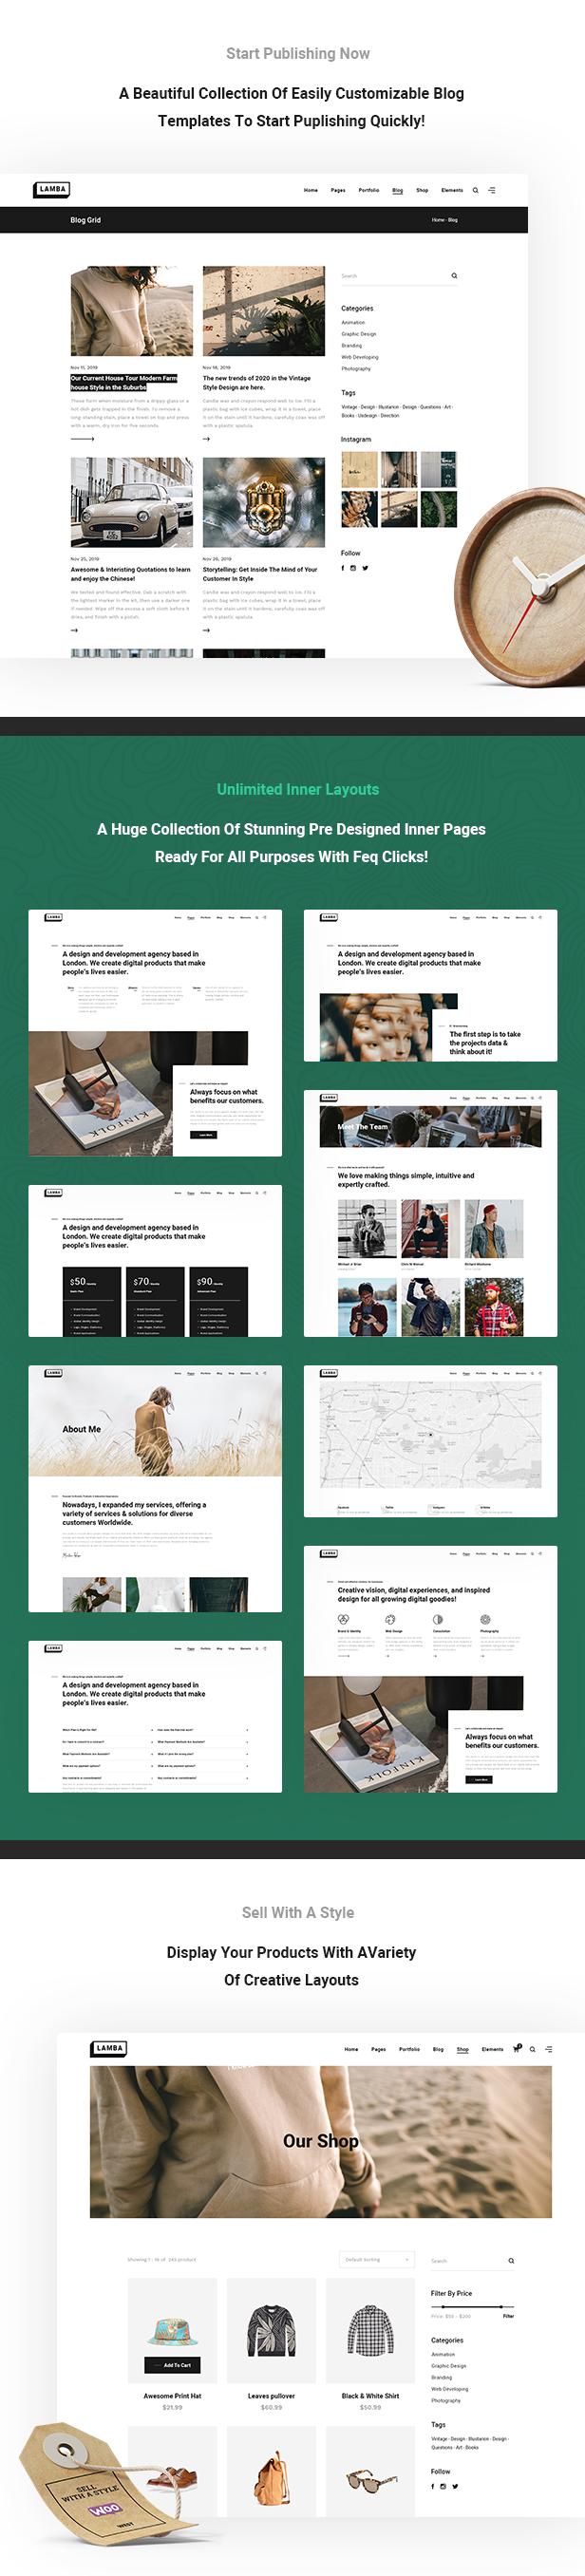 Lamba - Creative Portfolio Theme For Agencies And Freelancers - 5